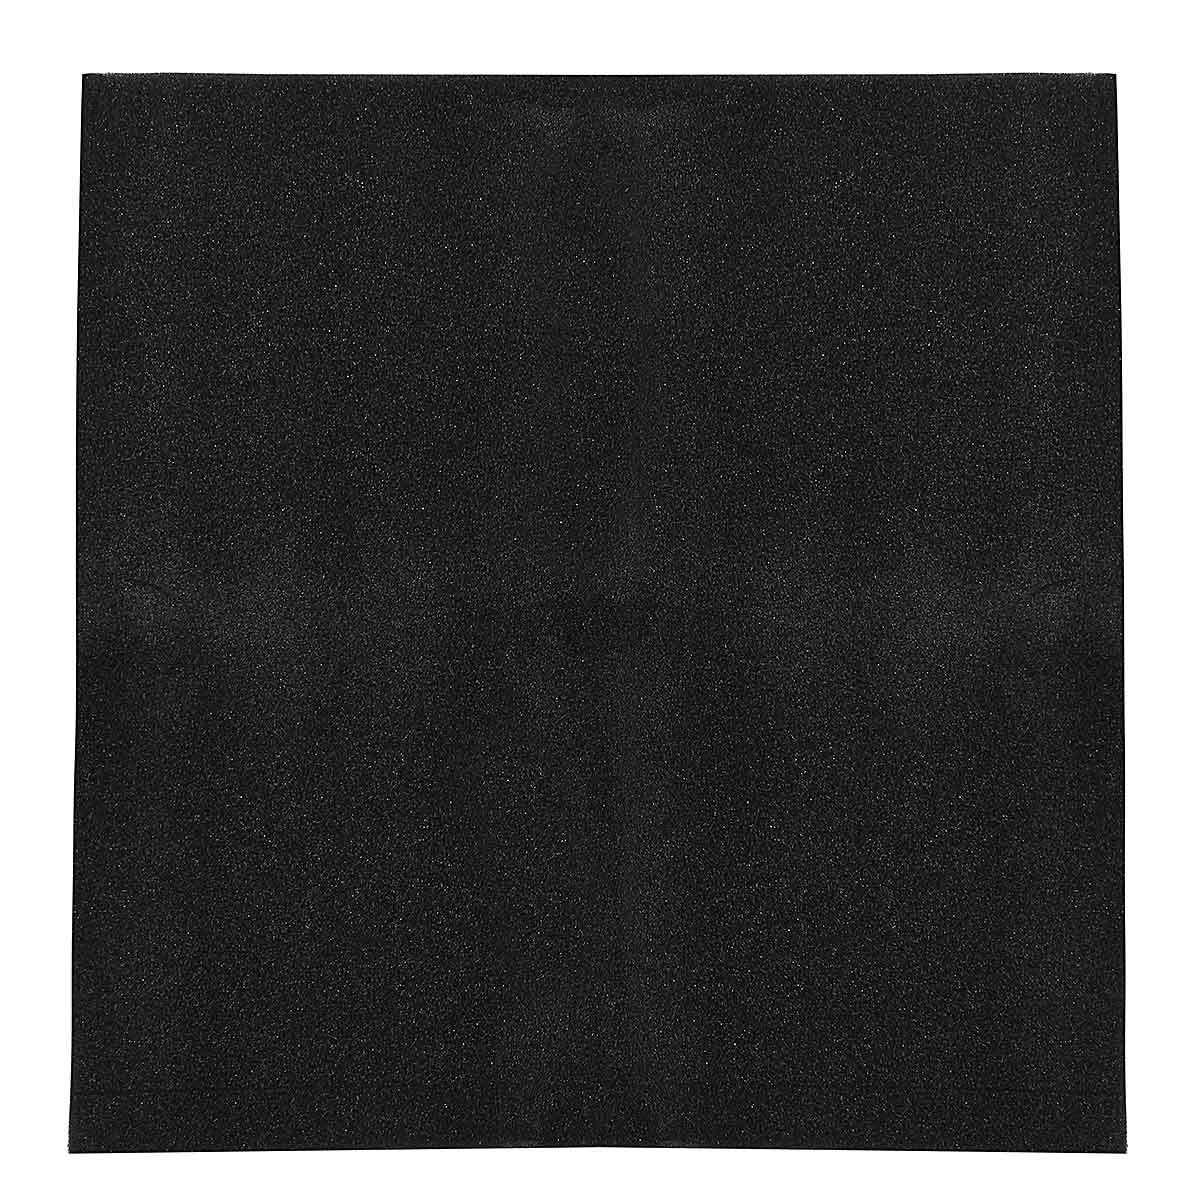 5pcs pyramiden akustik schallschutz schaumstoff d mmung. Black Bedroom Furniture Sets. Home Design Ideas